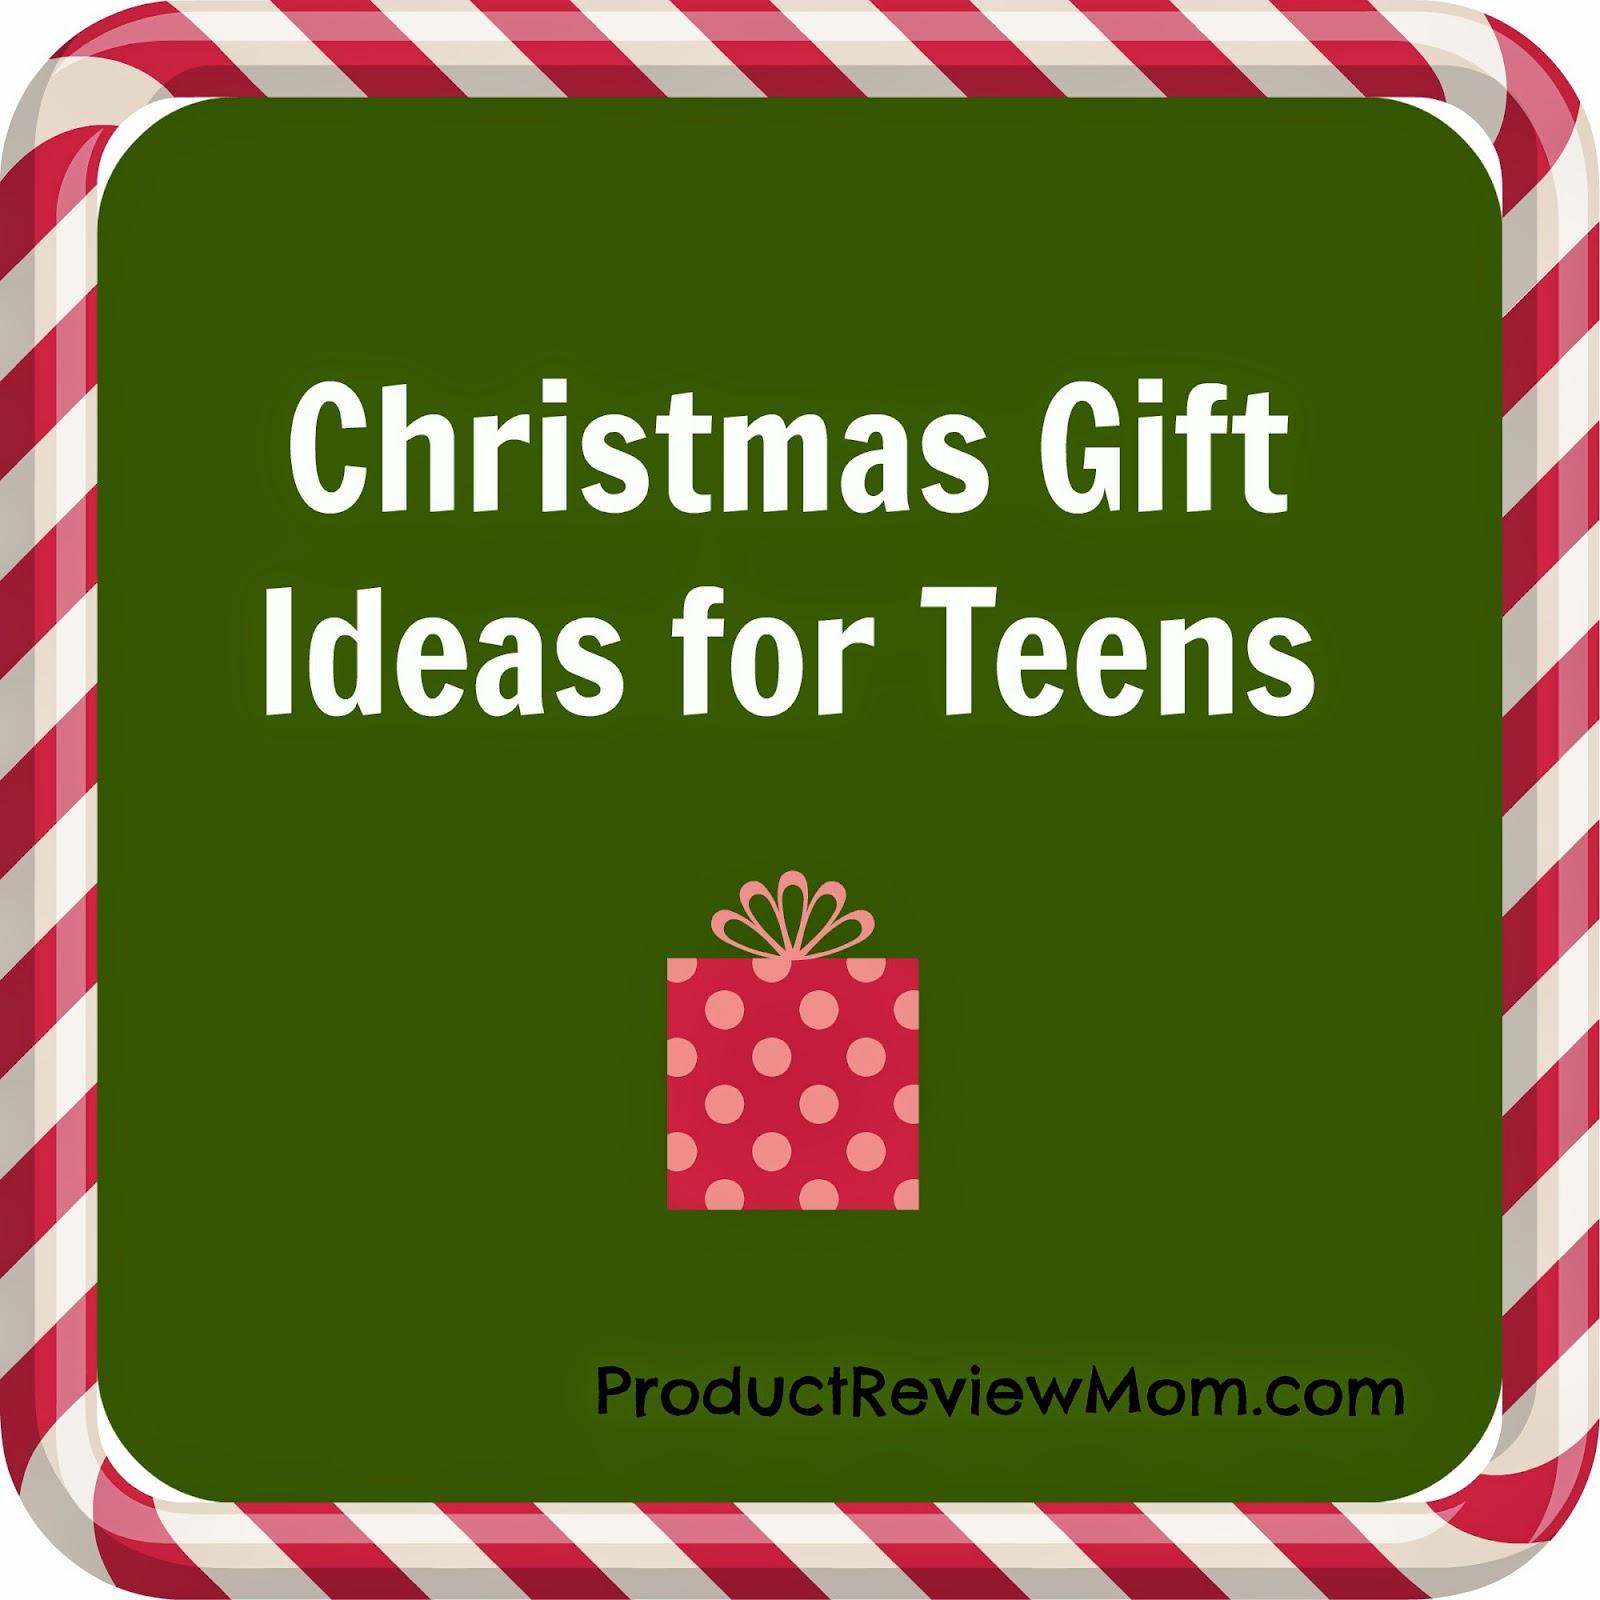 Christmas Gift Ideas for Teens #HolidayGiftGuide via www.Productreviewmom.com